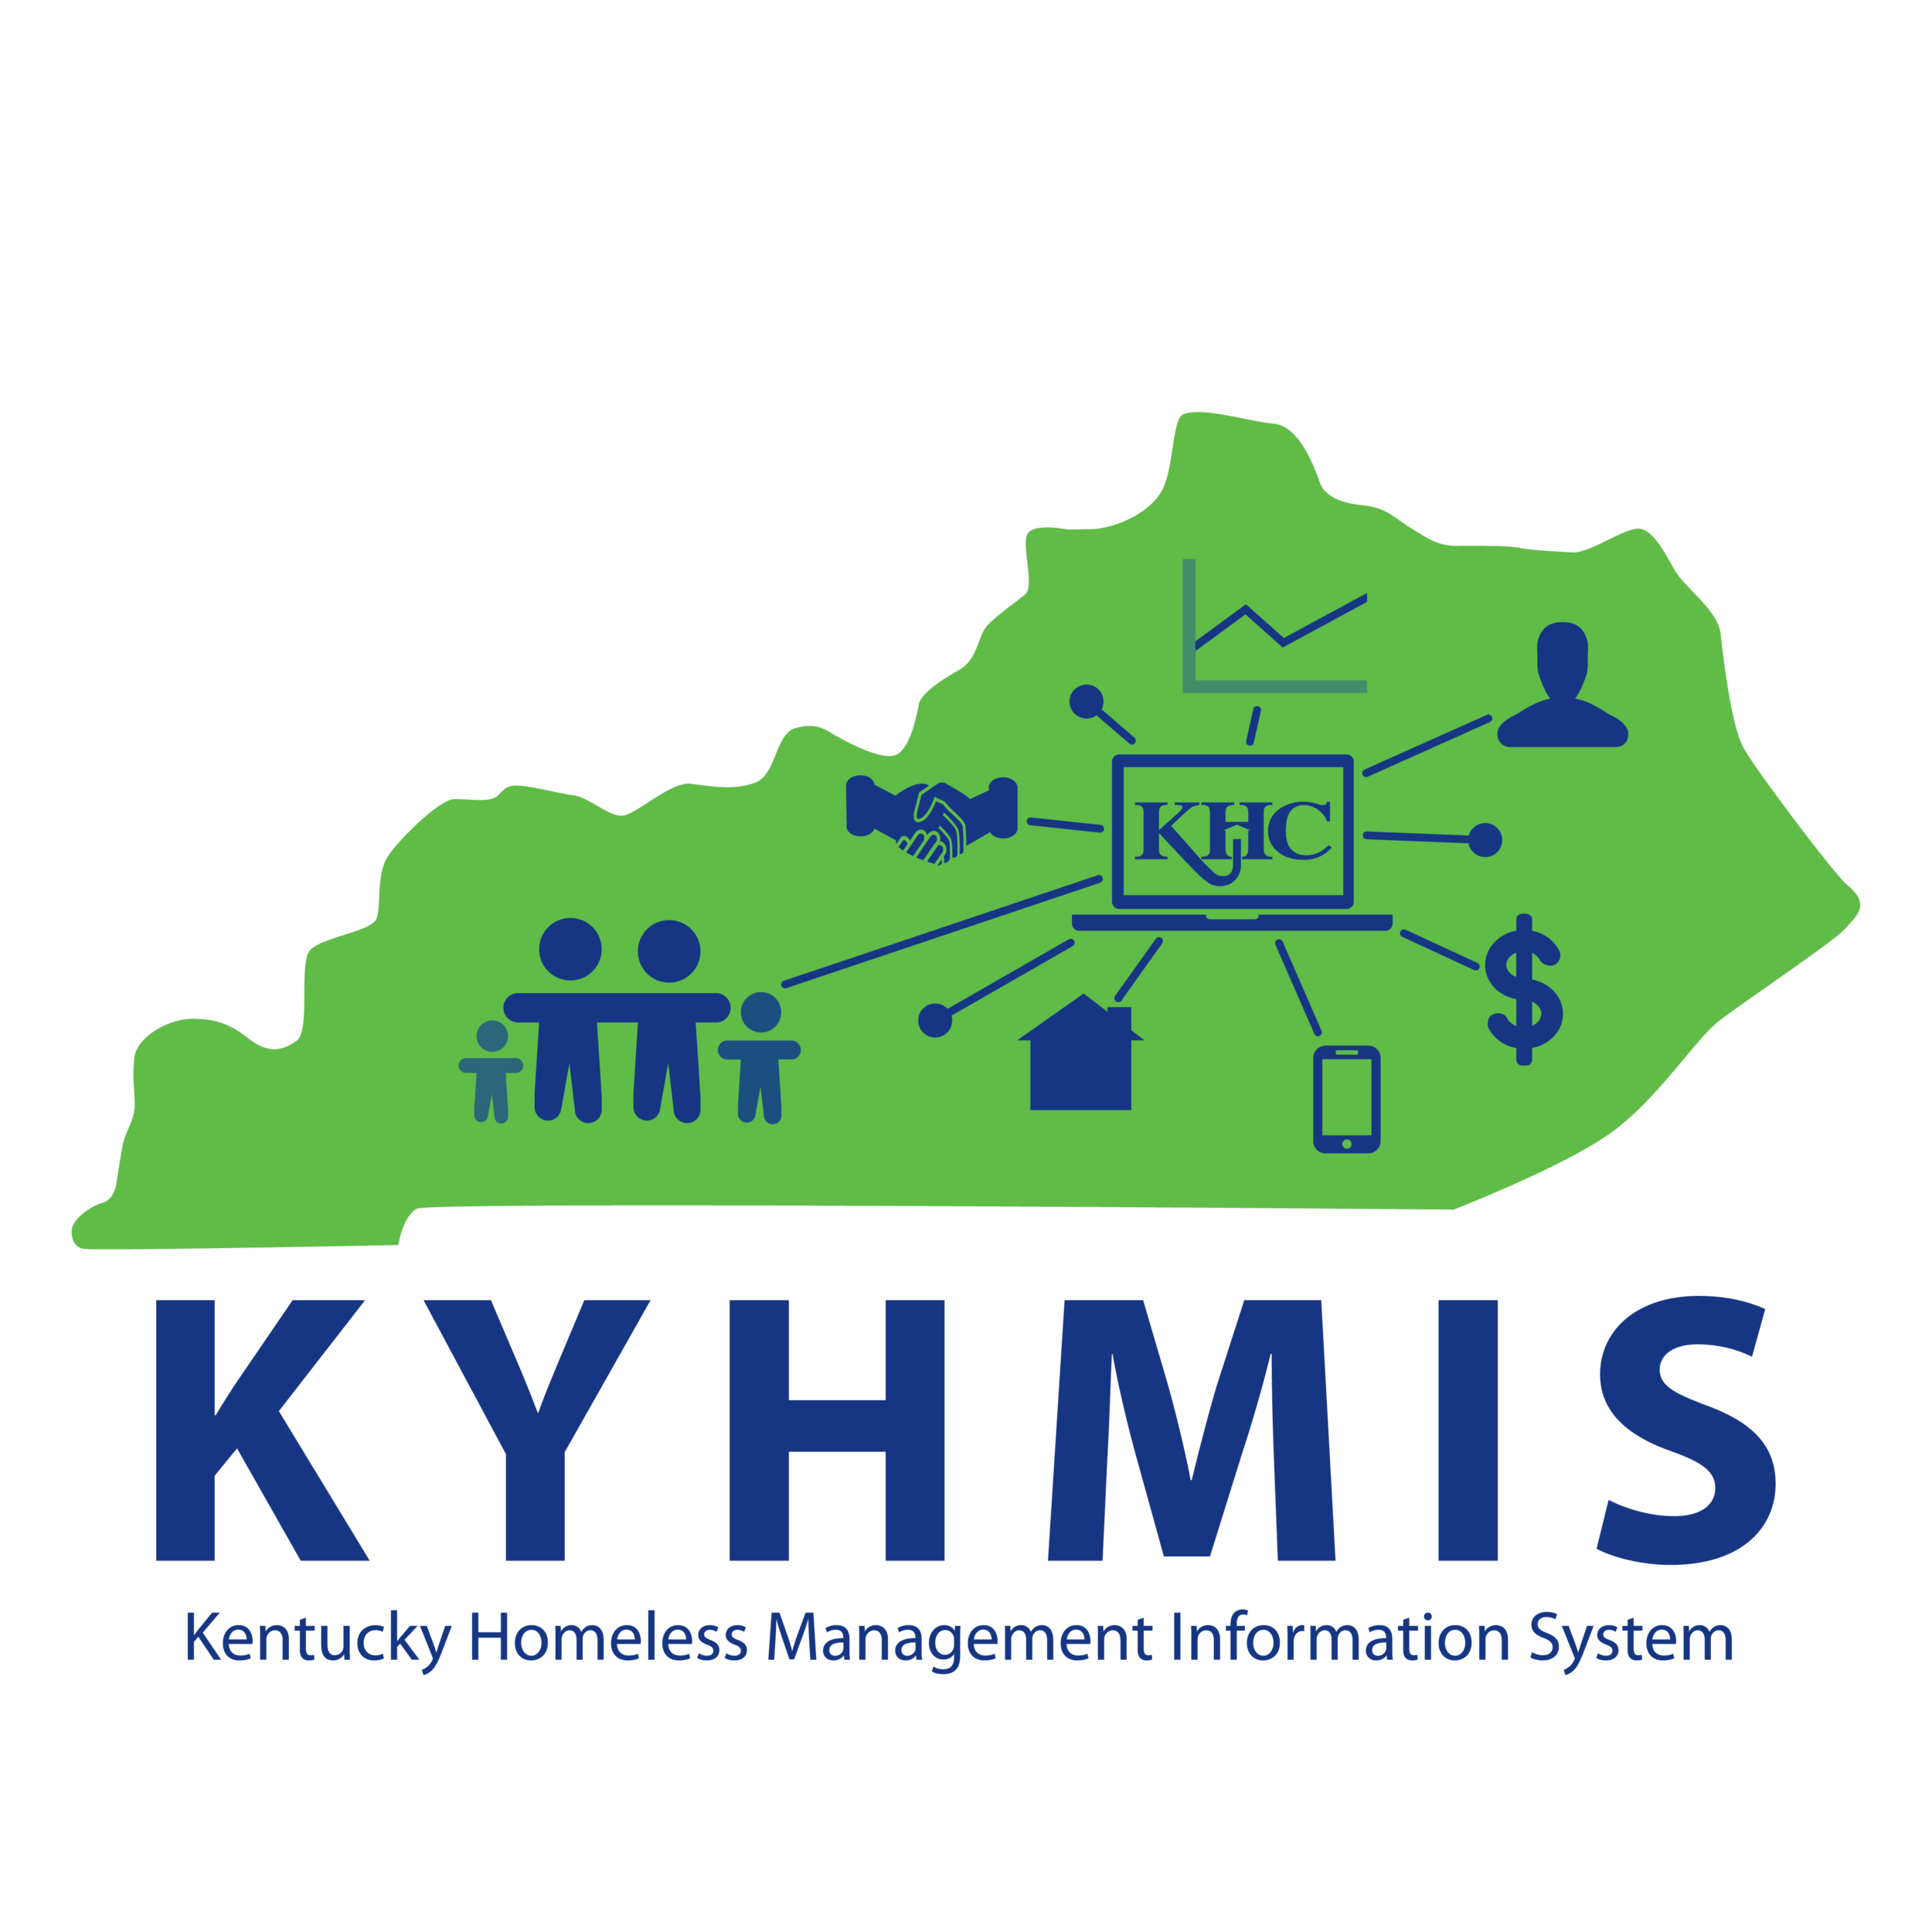 KHC-HMIS Logo_Square.png